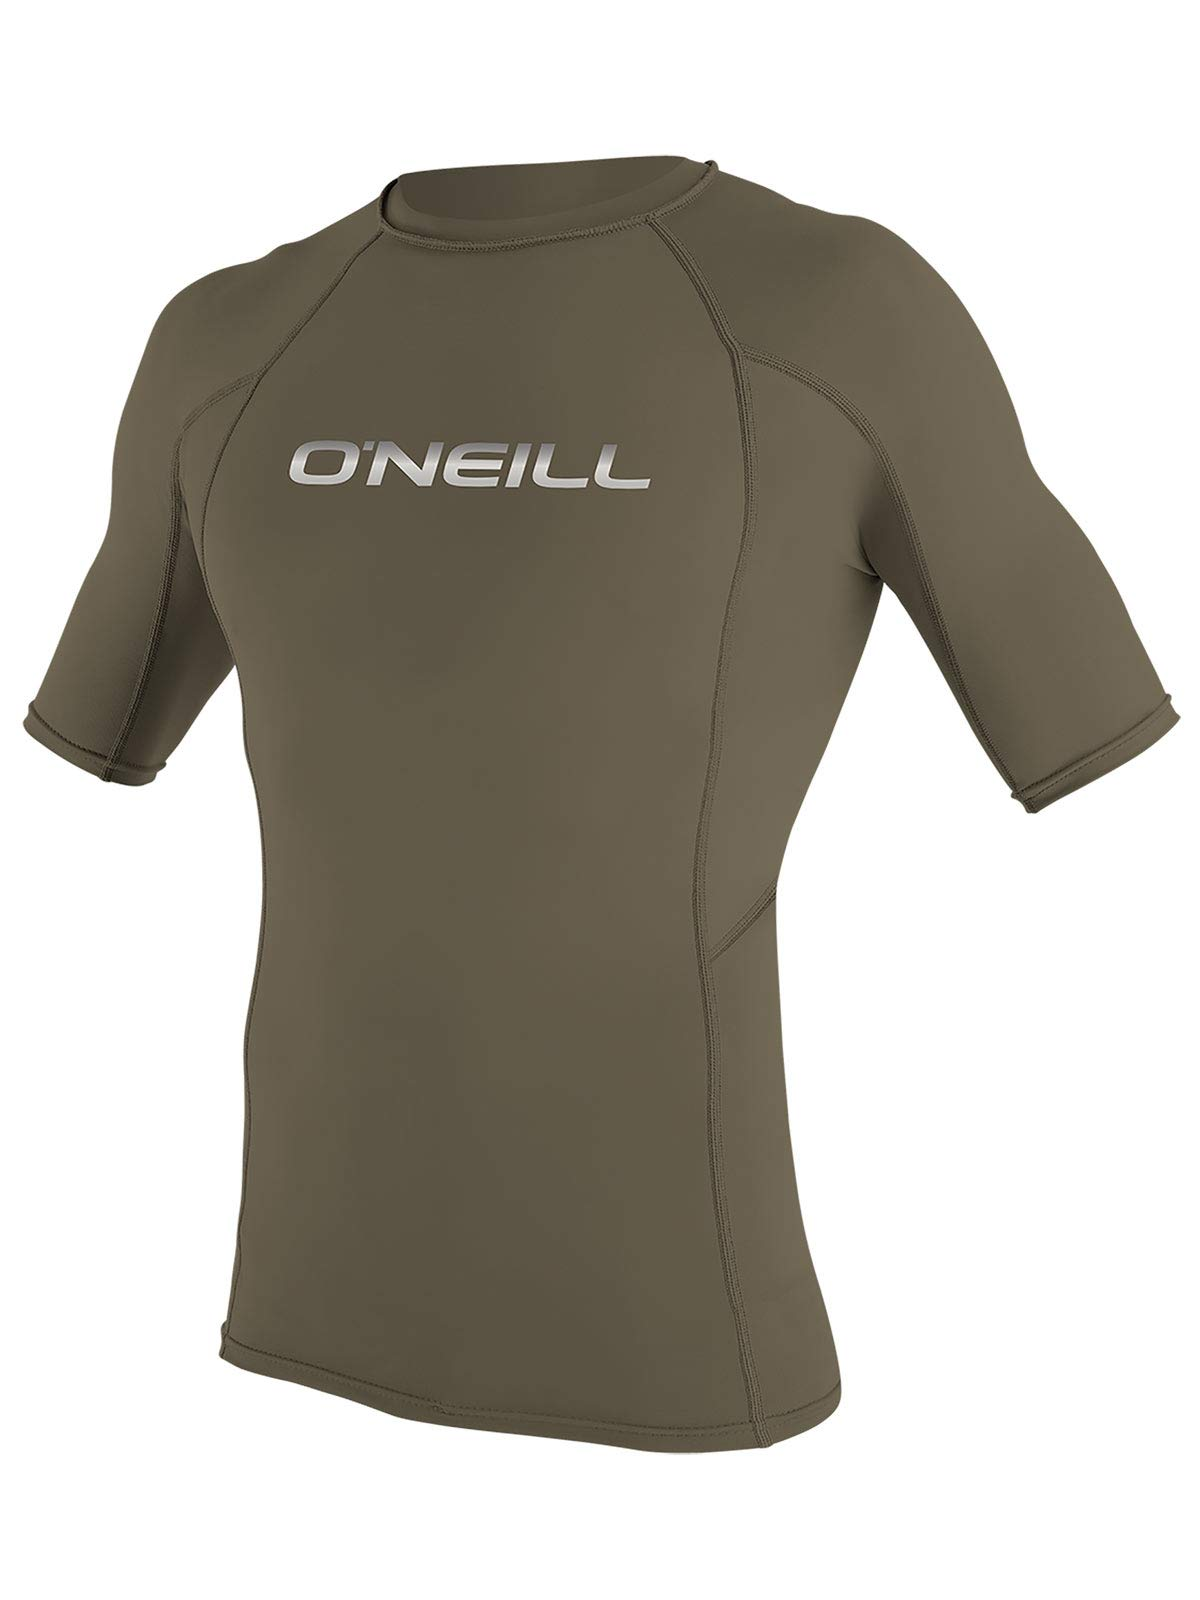 O'Neill Men's Basic Skins Short Sleeve Rashguard 4XL Khaki (3341IB)